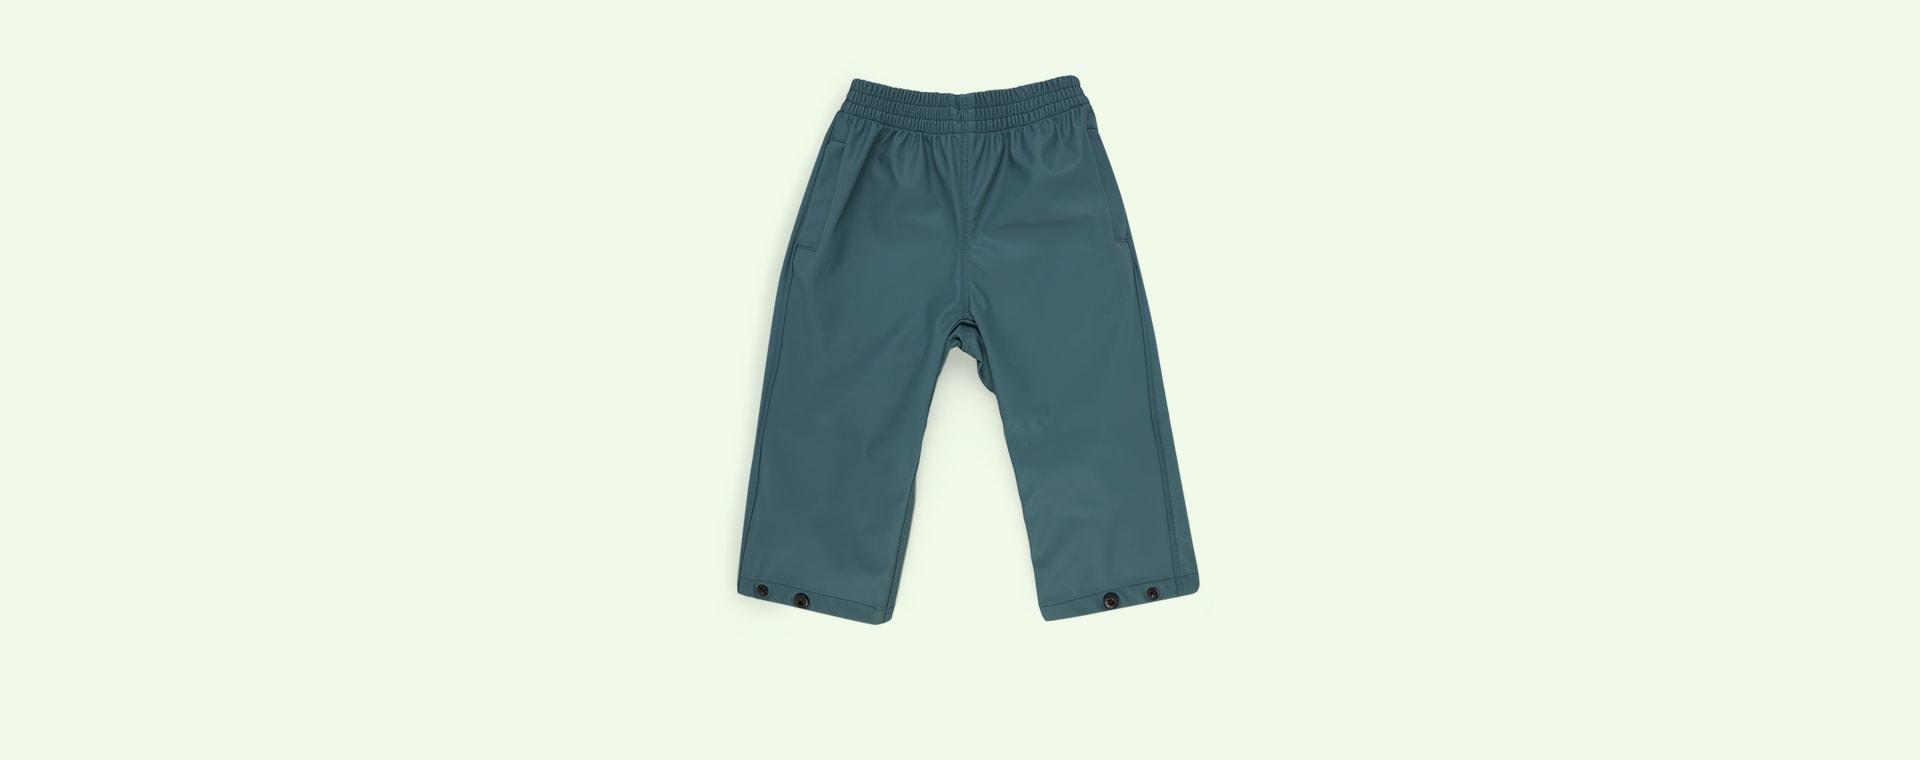 Sage Green GOSOAKY Unisex Waterproofs Rain Pants